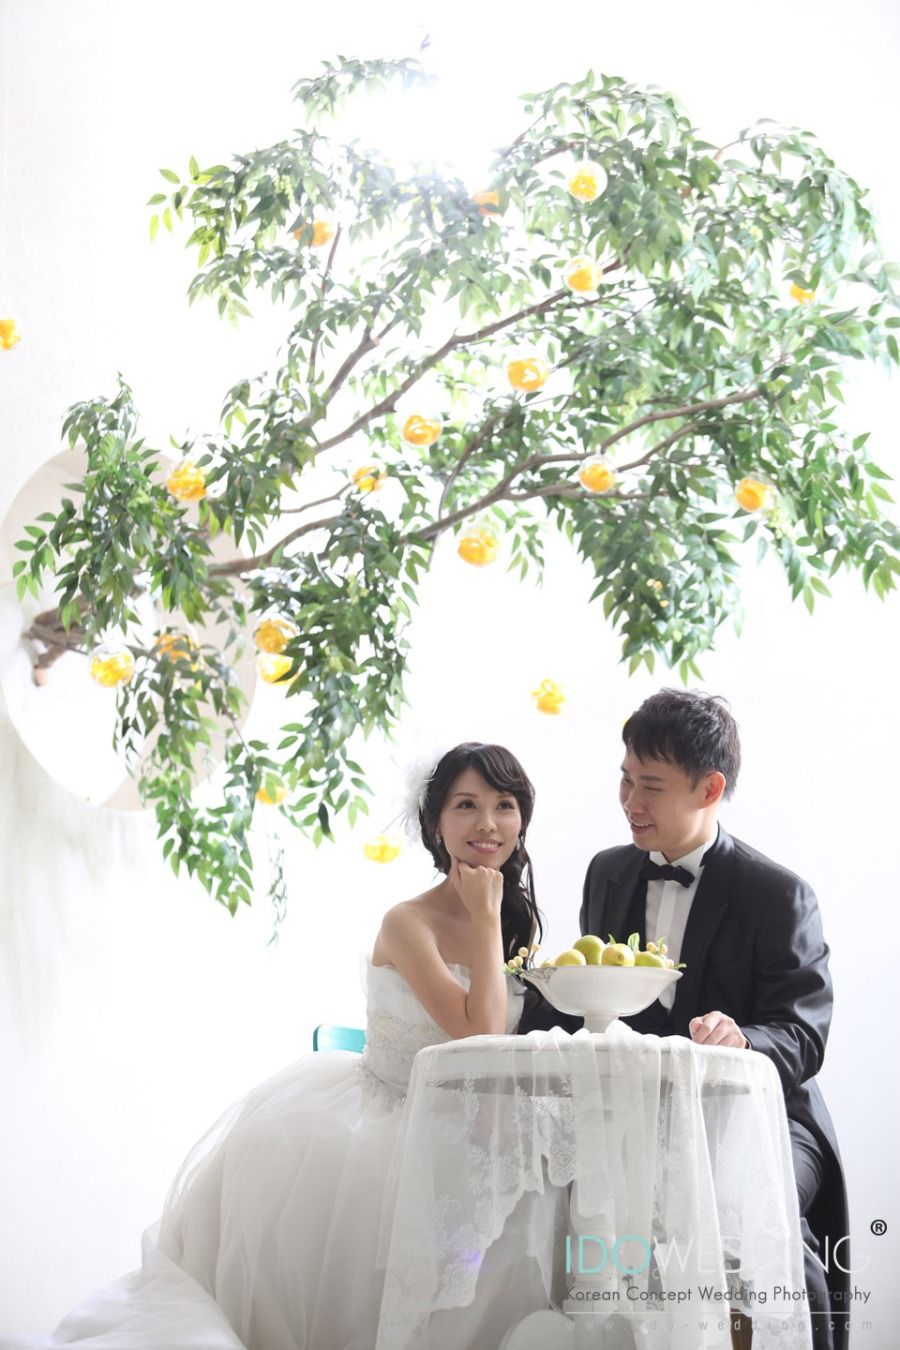 Korea Wedding, Korea Wedding Photo, Korean Wedding, Korean Wedding Photography, Korean Pre-wedding Photo, Korean Concept Wedding Photography, Korean Wedding Gown, Korean Hair & Makeup, Korean Travel Tips, Singapore Wedding Photography, We Got Married, IDOWEDDING